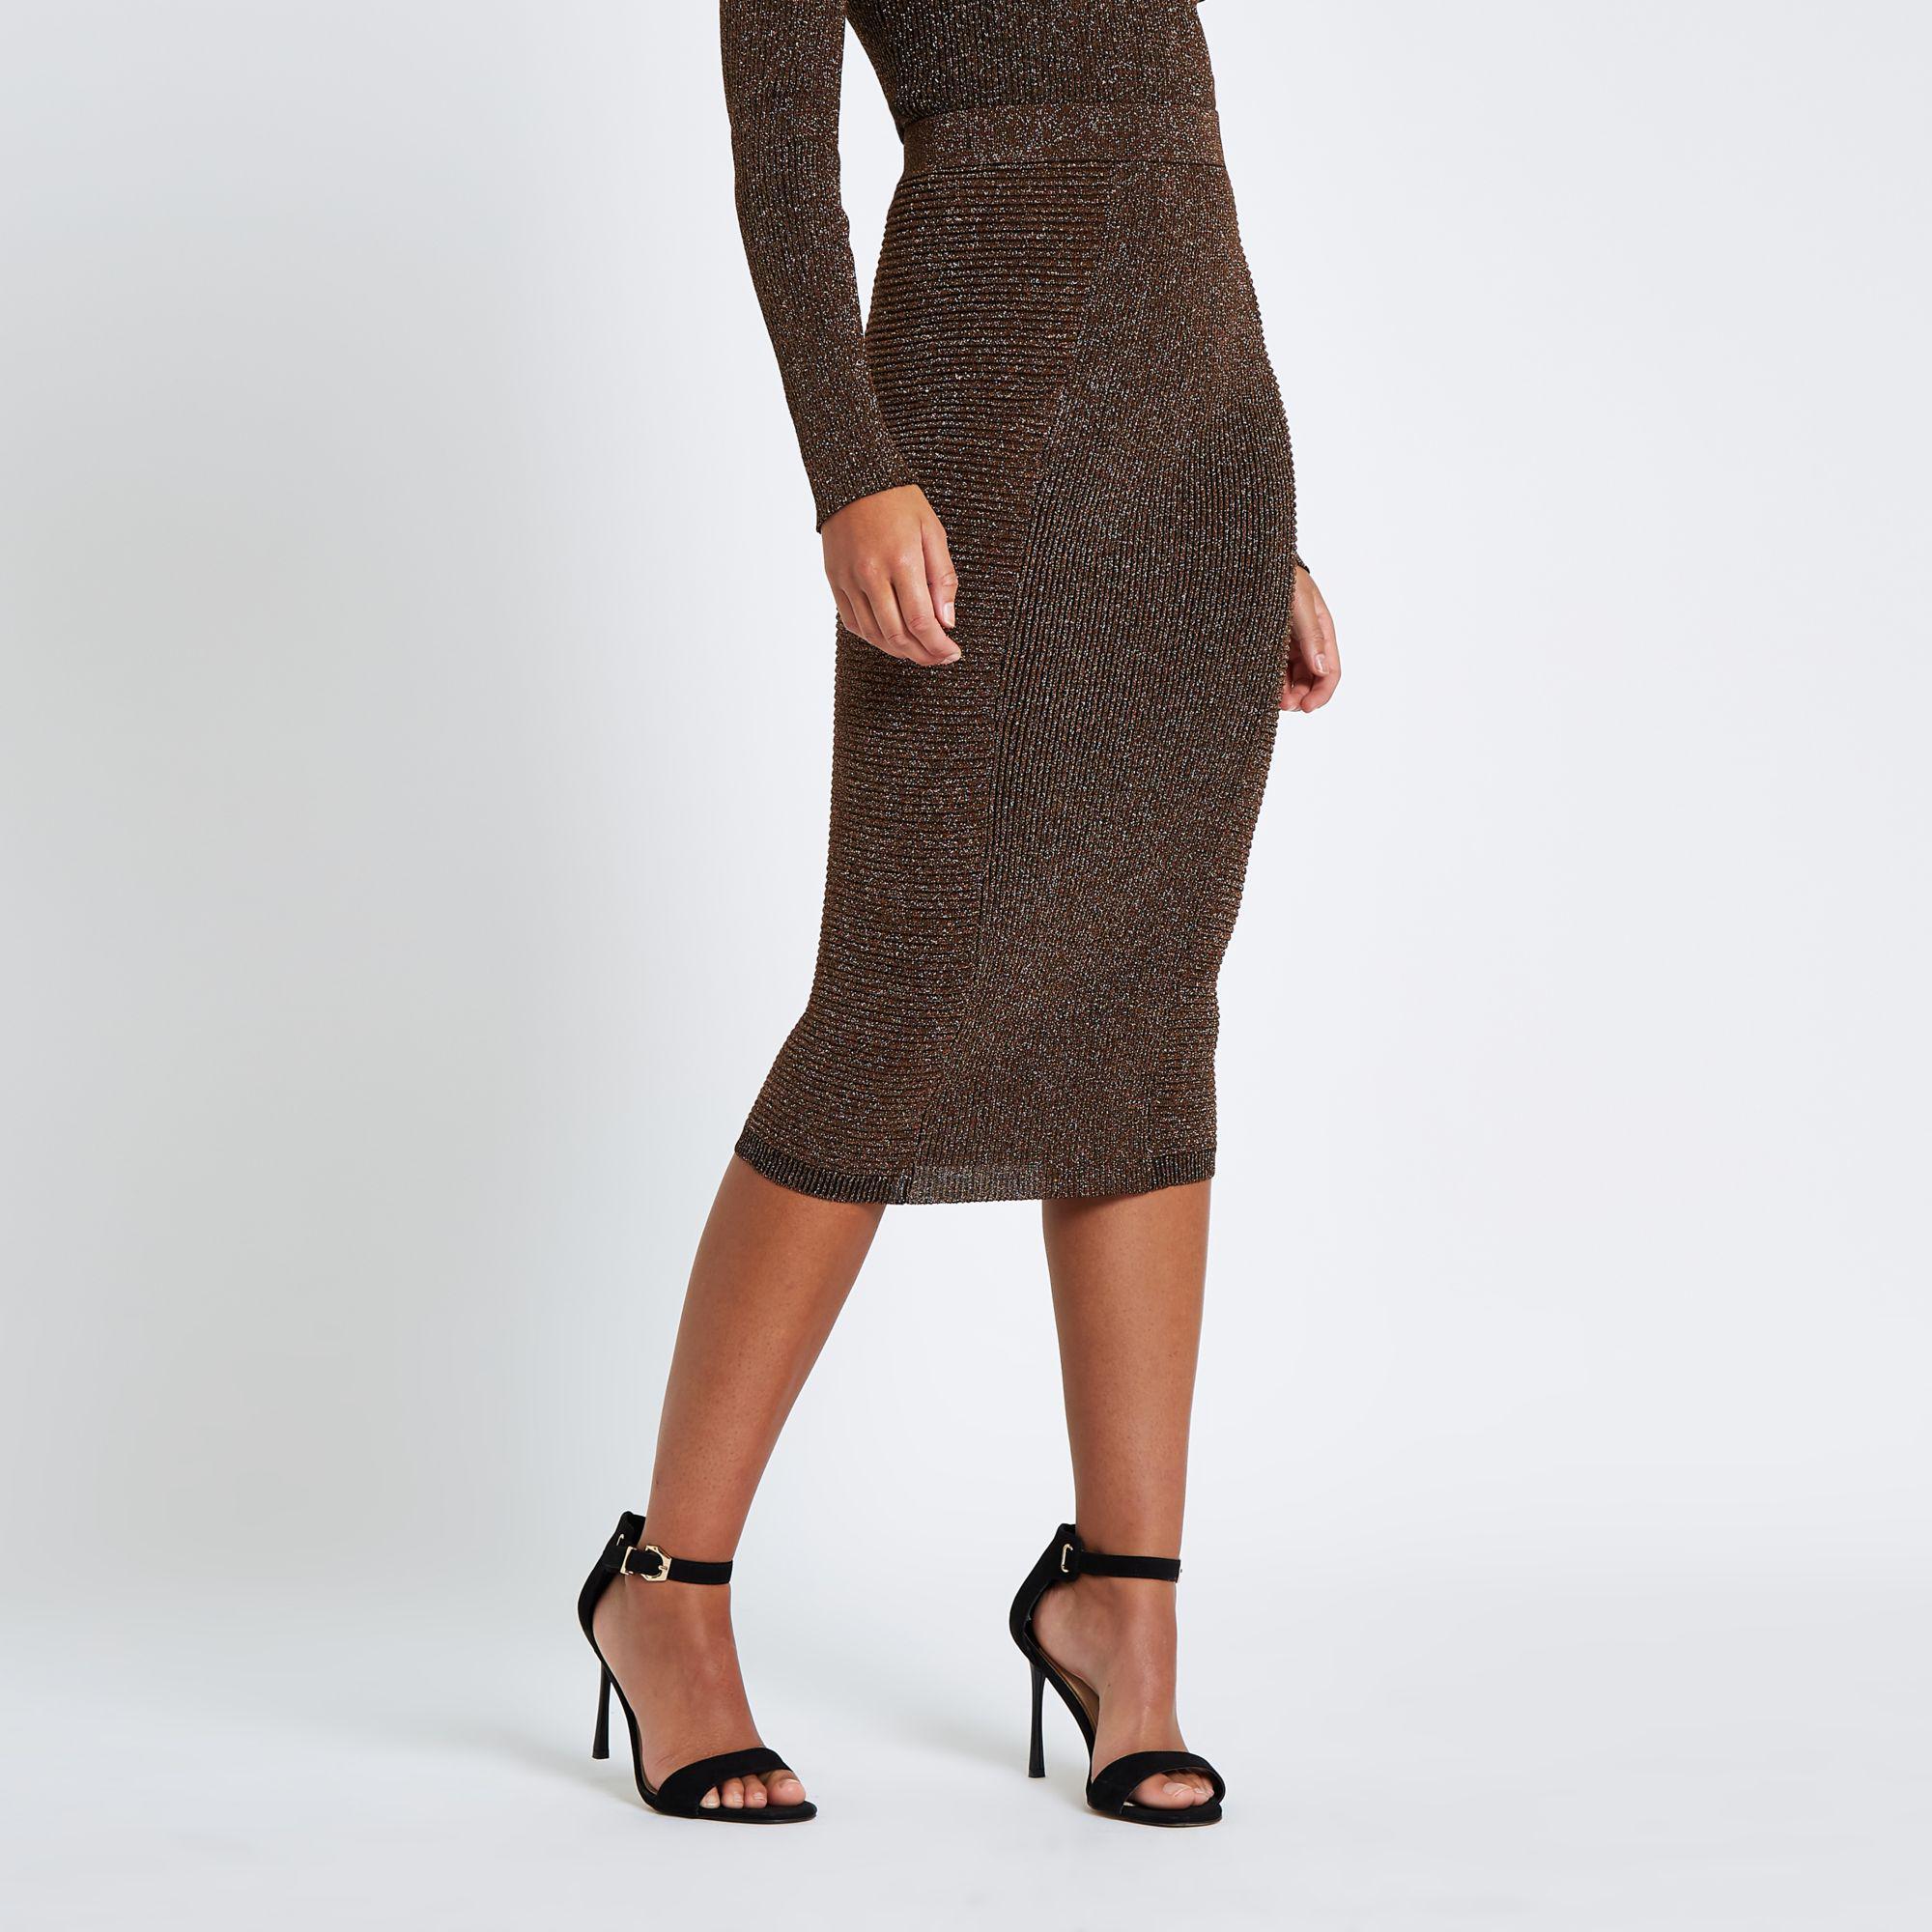 6d9b1c179 River Island Metallic Pencil Skirt in Brown - Lyst